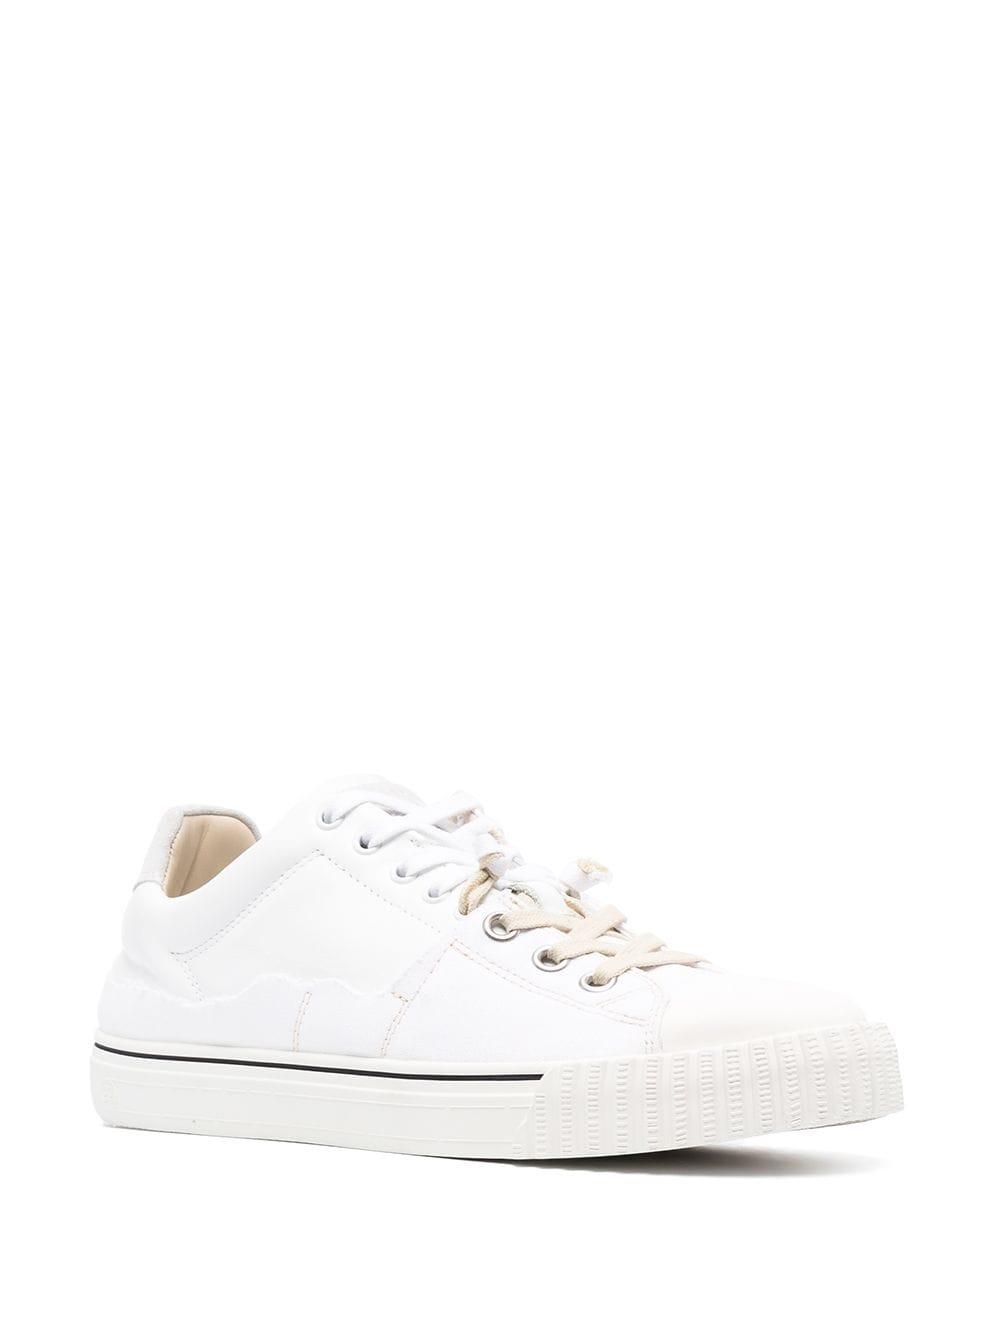 Sneakers Combinata Uomo MAISON MARGIELA   Sneakers   S57WS0391 P4022H8548